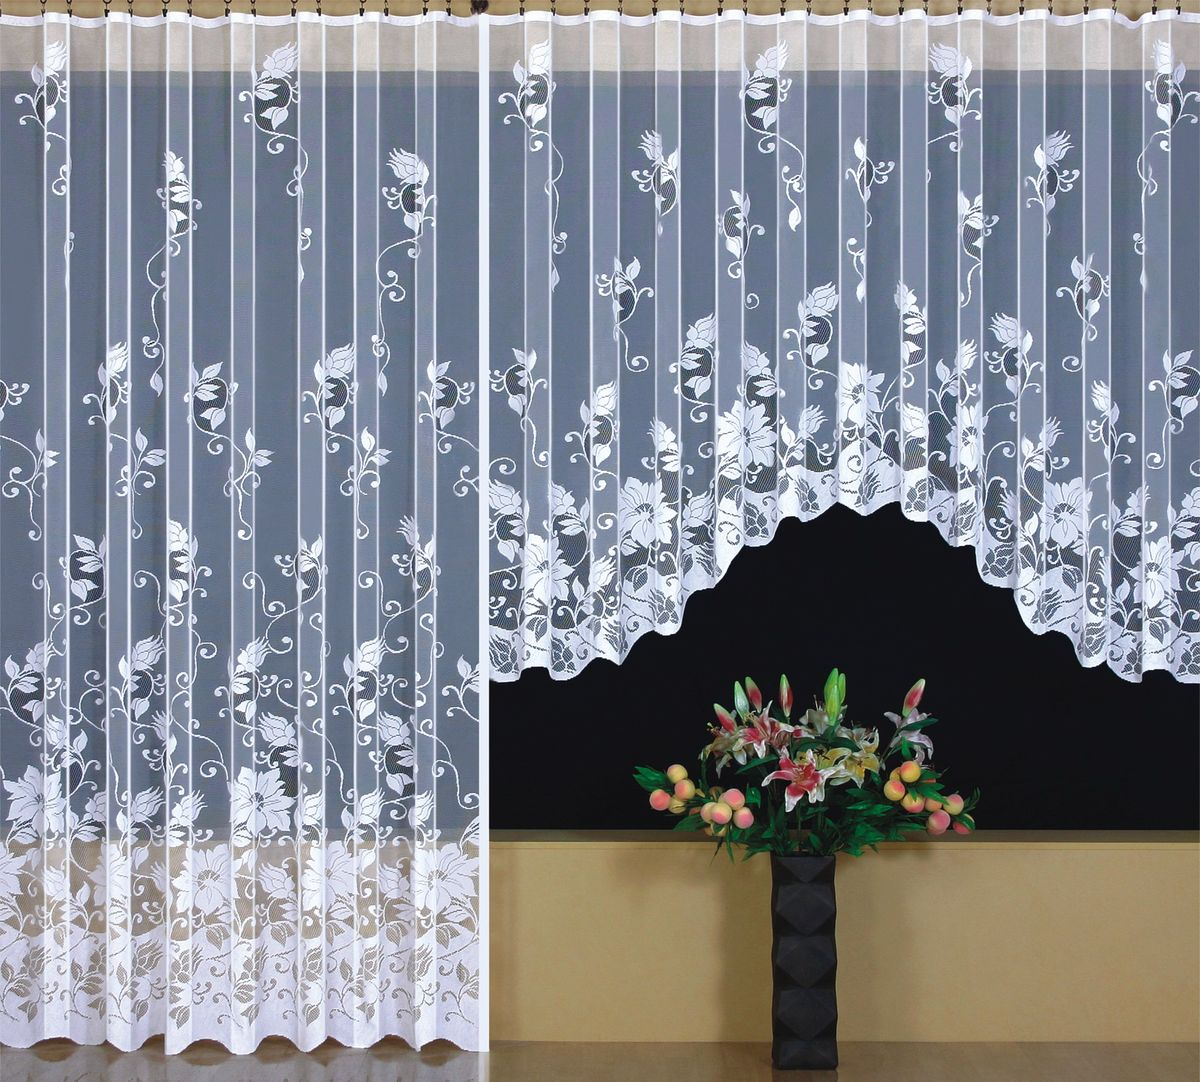 Комплект гардин для балк.двери WISAN 300*160+200*250. 9415+941398299571Комплект гардин для балк.двери WISAN 300*160+200*250. 9415+9413Материал: 100% п/э, размер: 300*160+200*250, цвет: белый